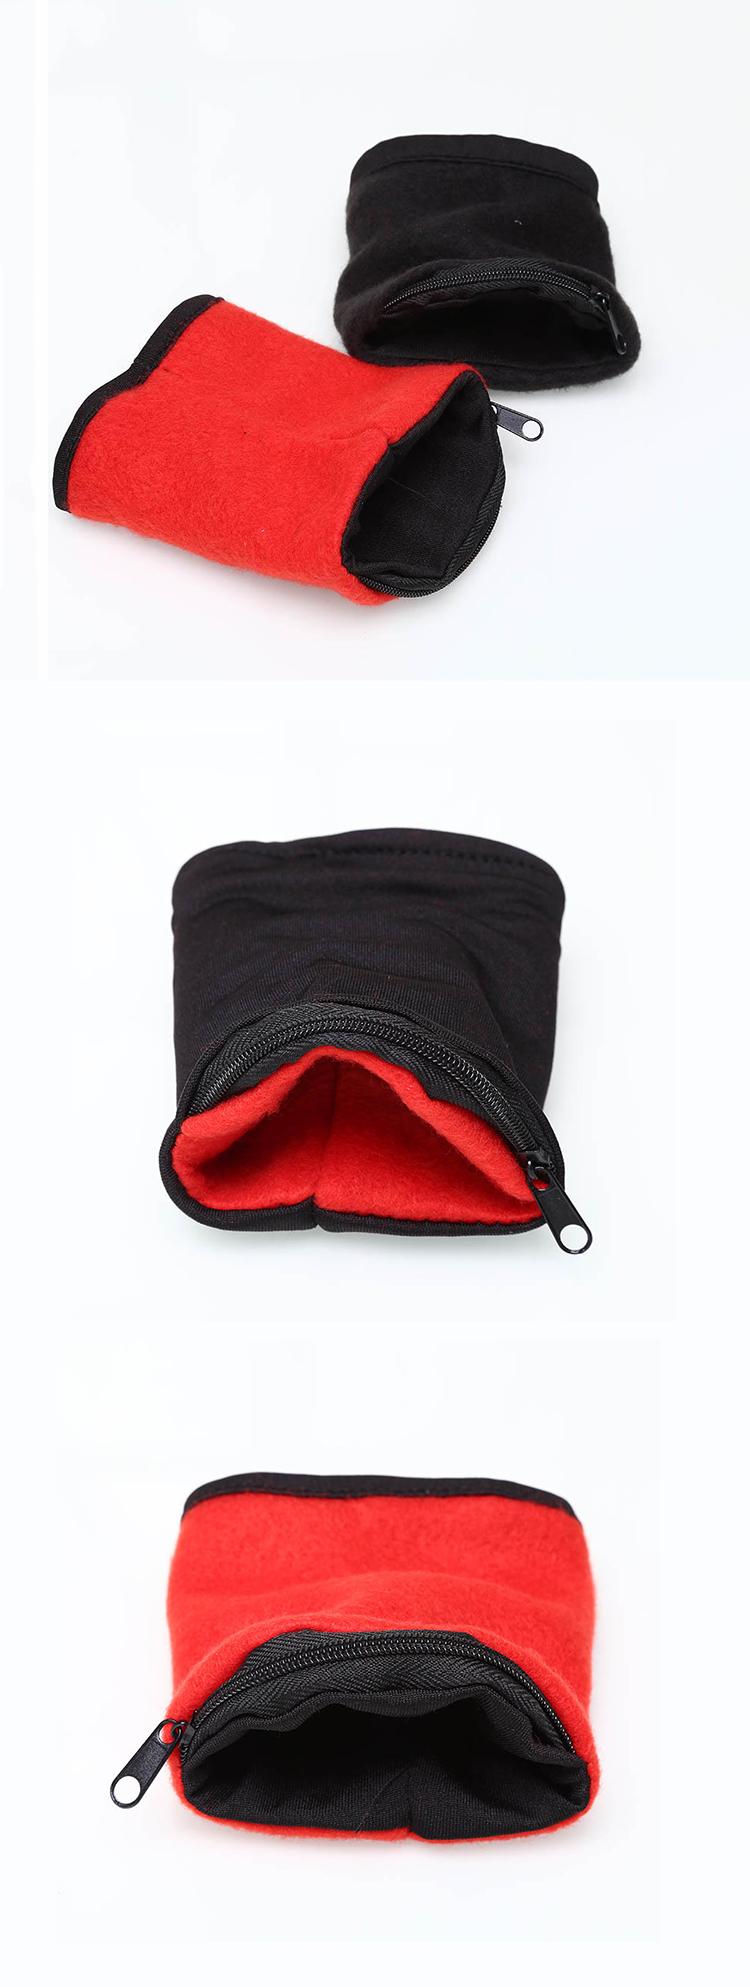 Honana HN-B9 3 Colors Zipper Wristband Organizer Pocket Card Coin Key Storage Bag Sport Wallet